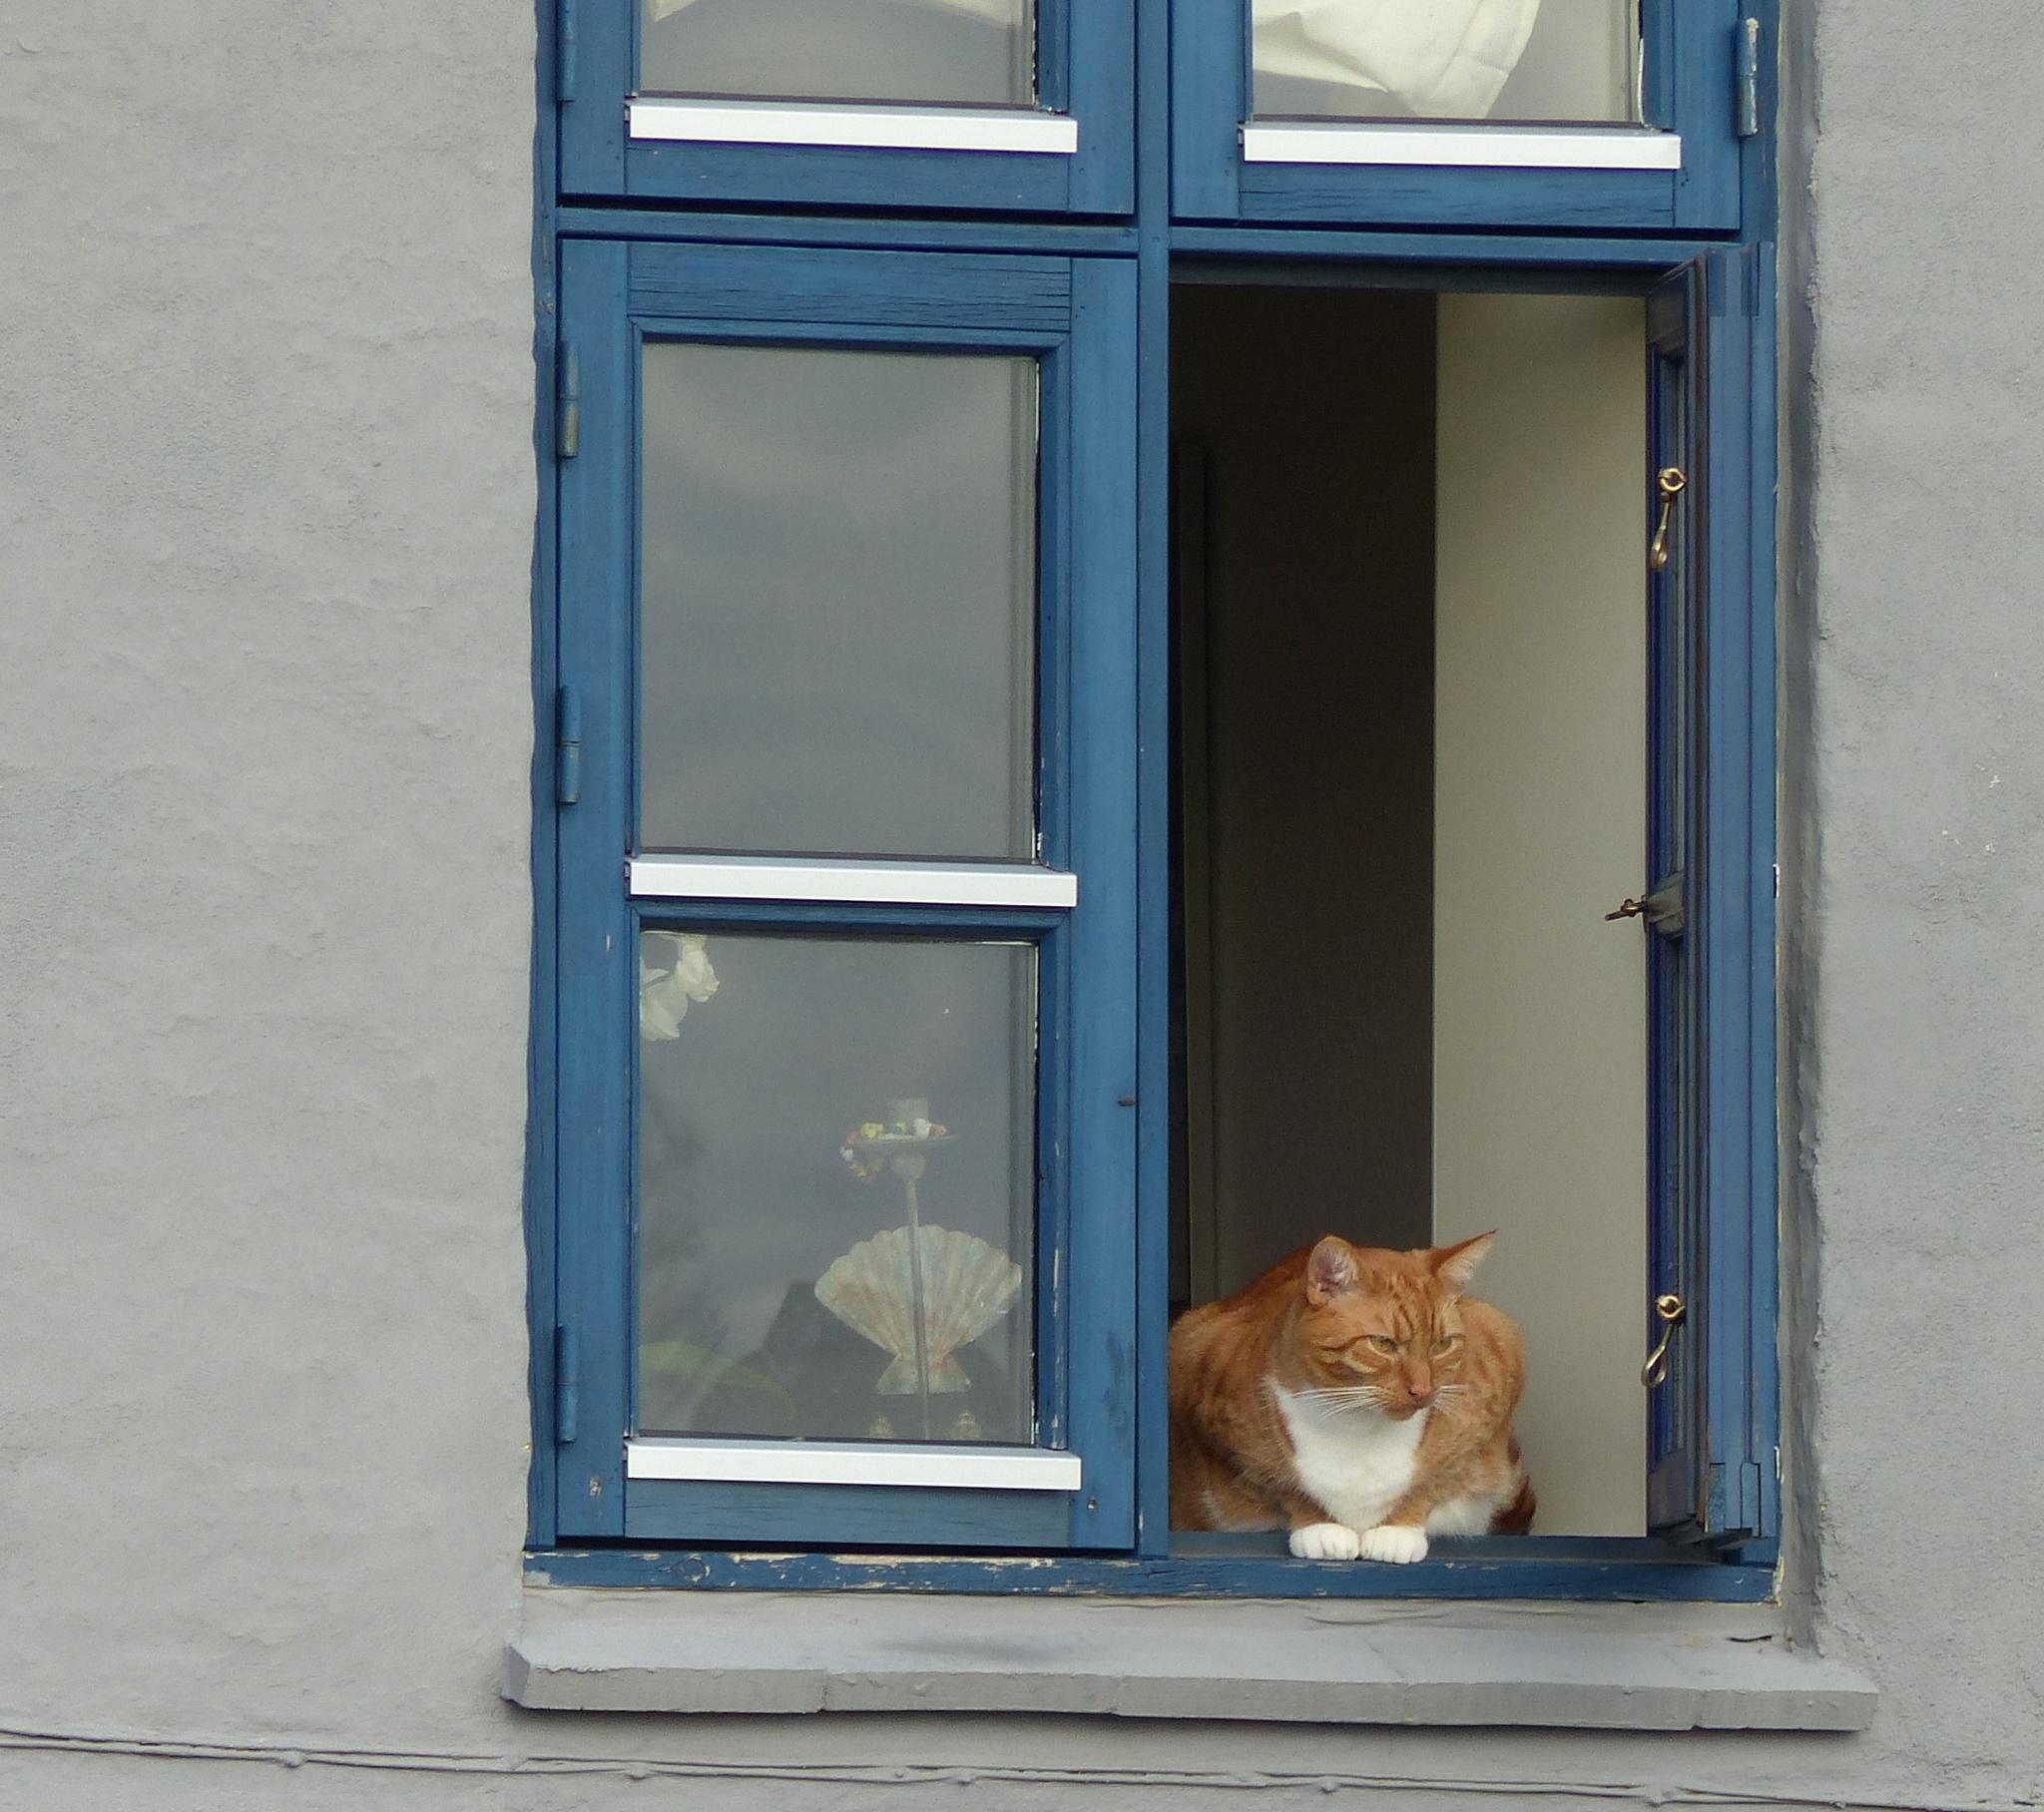 My neighbour across the street by Lars M.